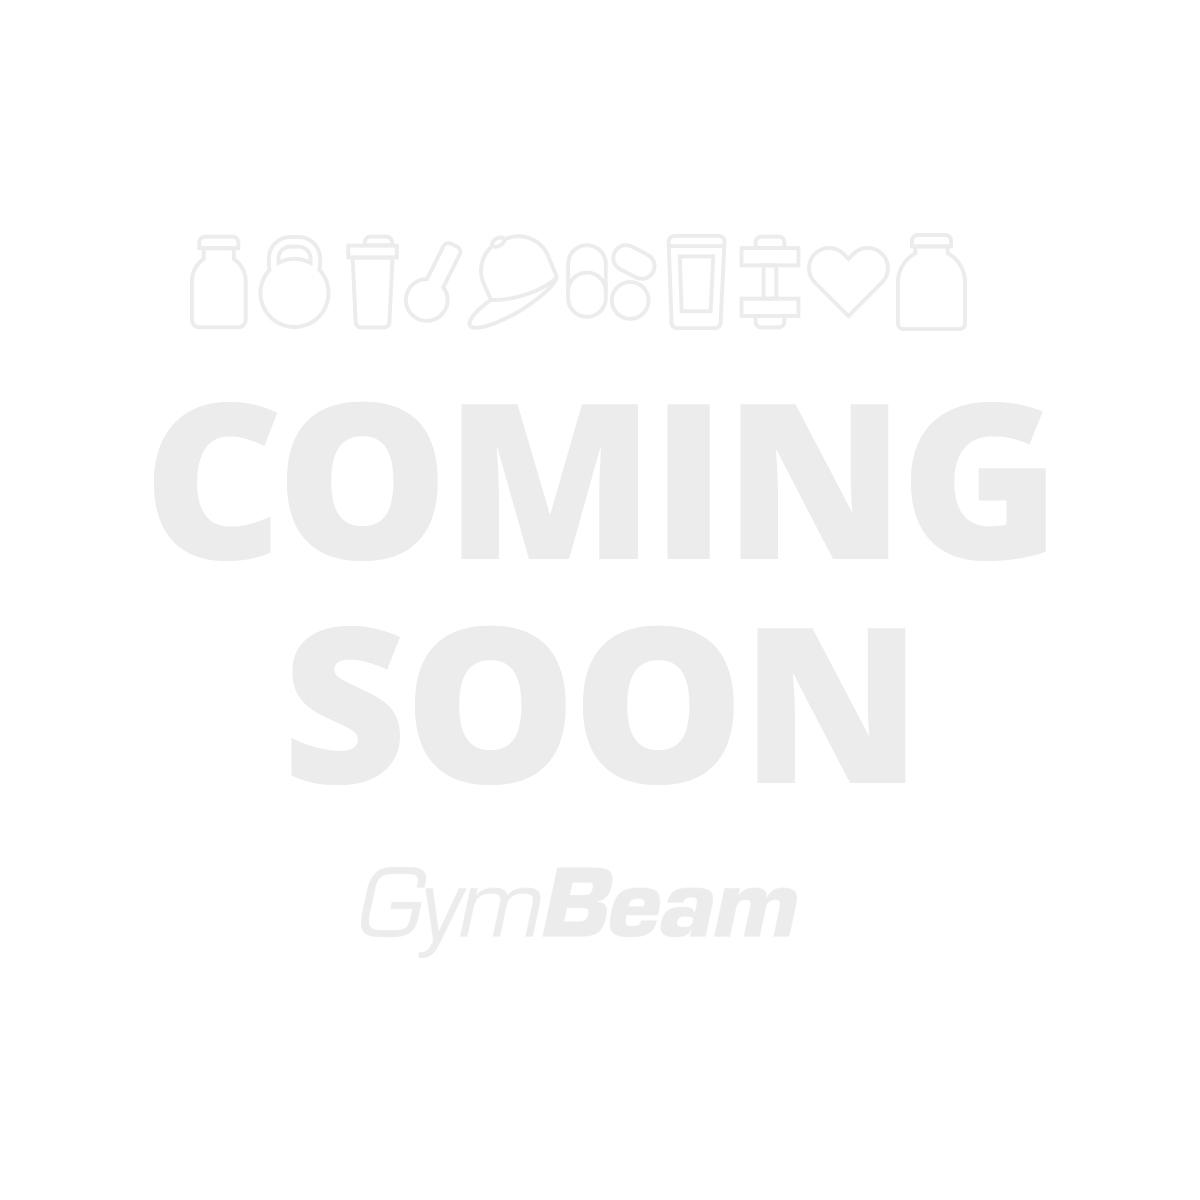 Fitness belt Ronnie - GymBeam